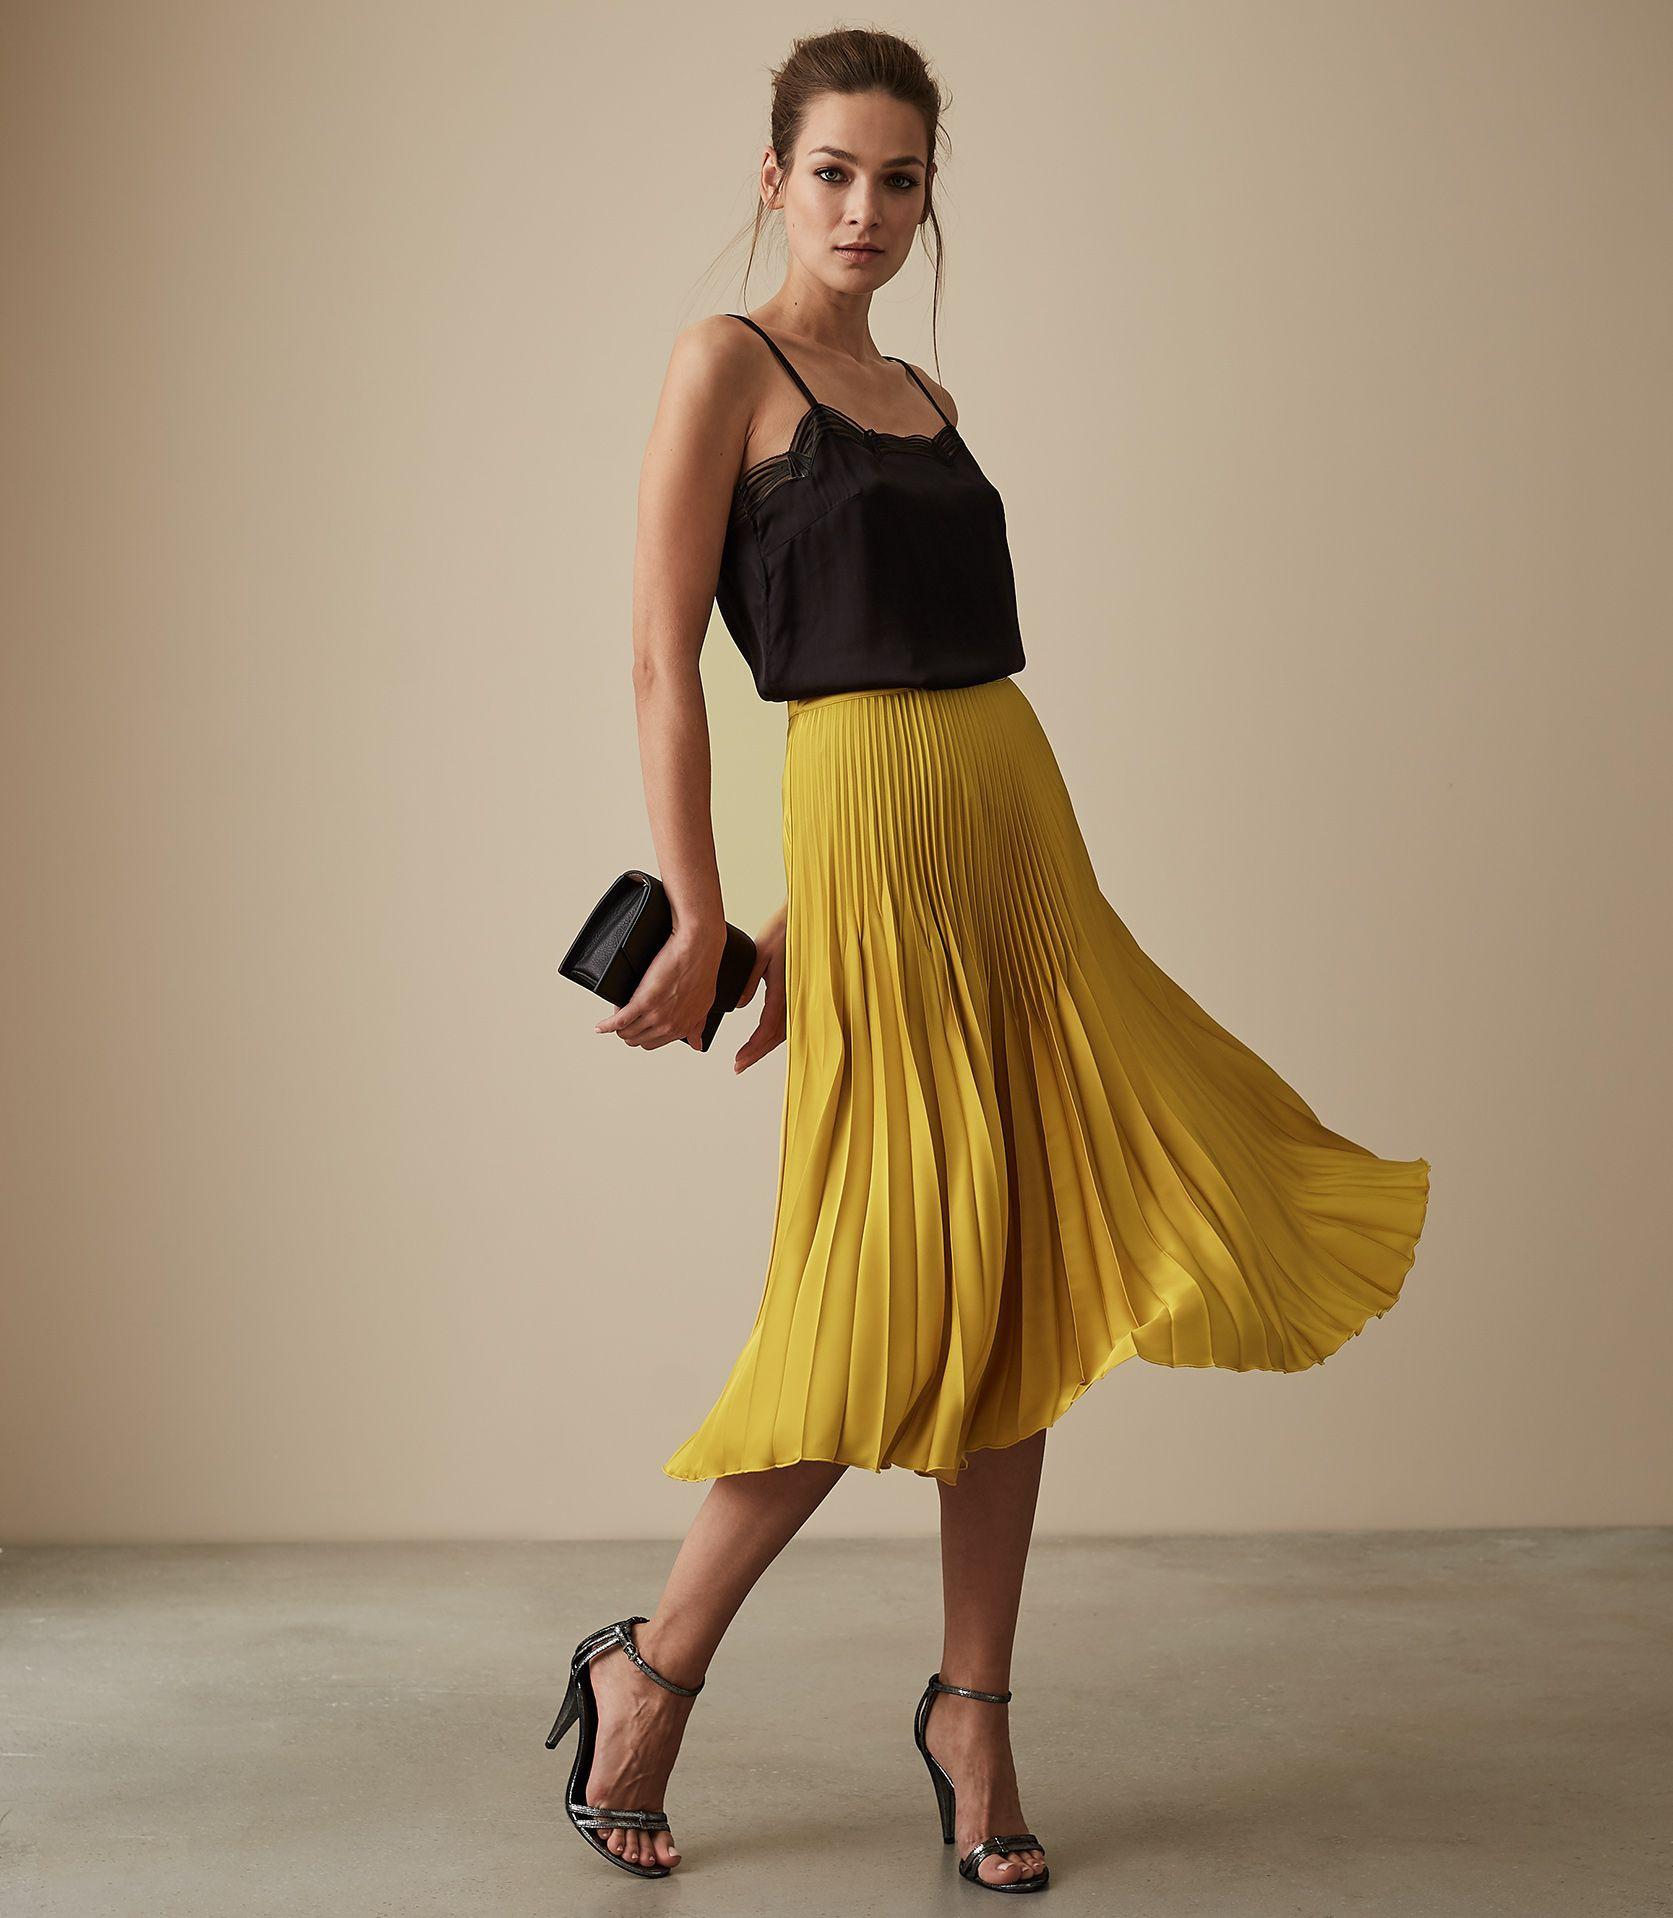 Black top yellow skirt dress